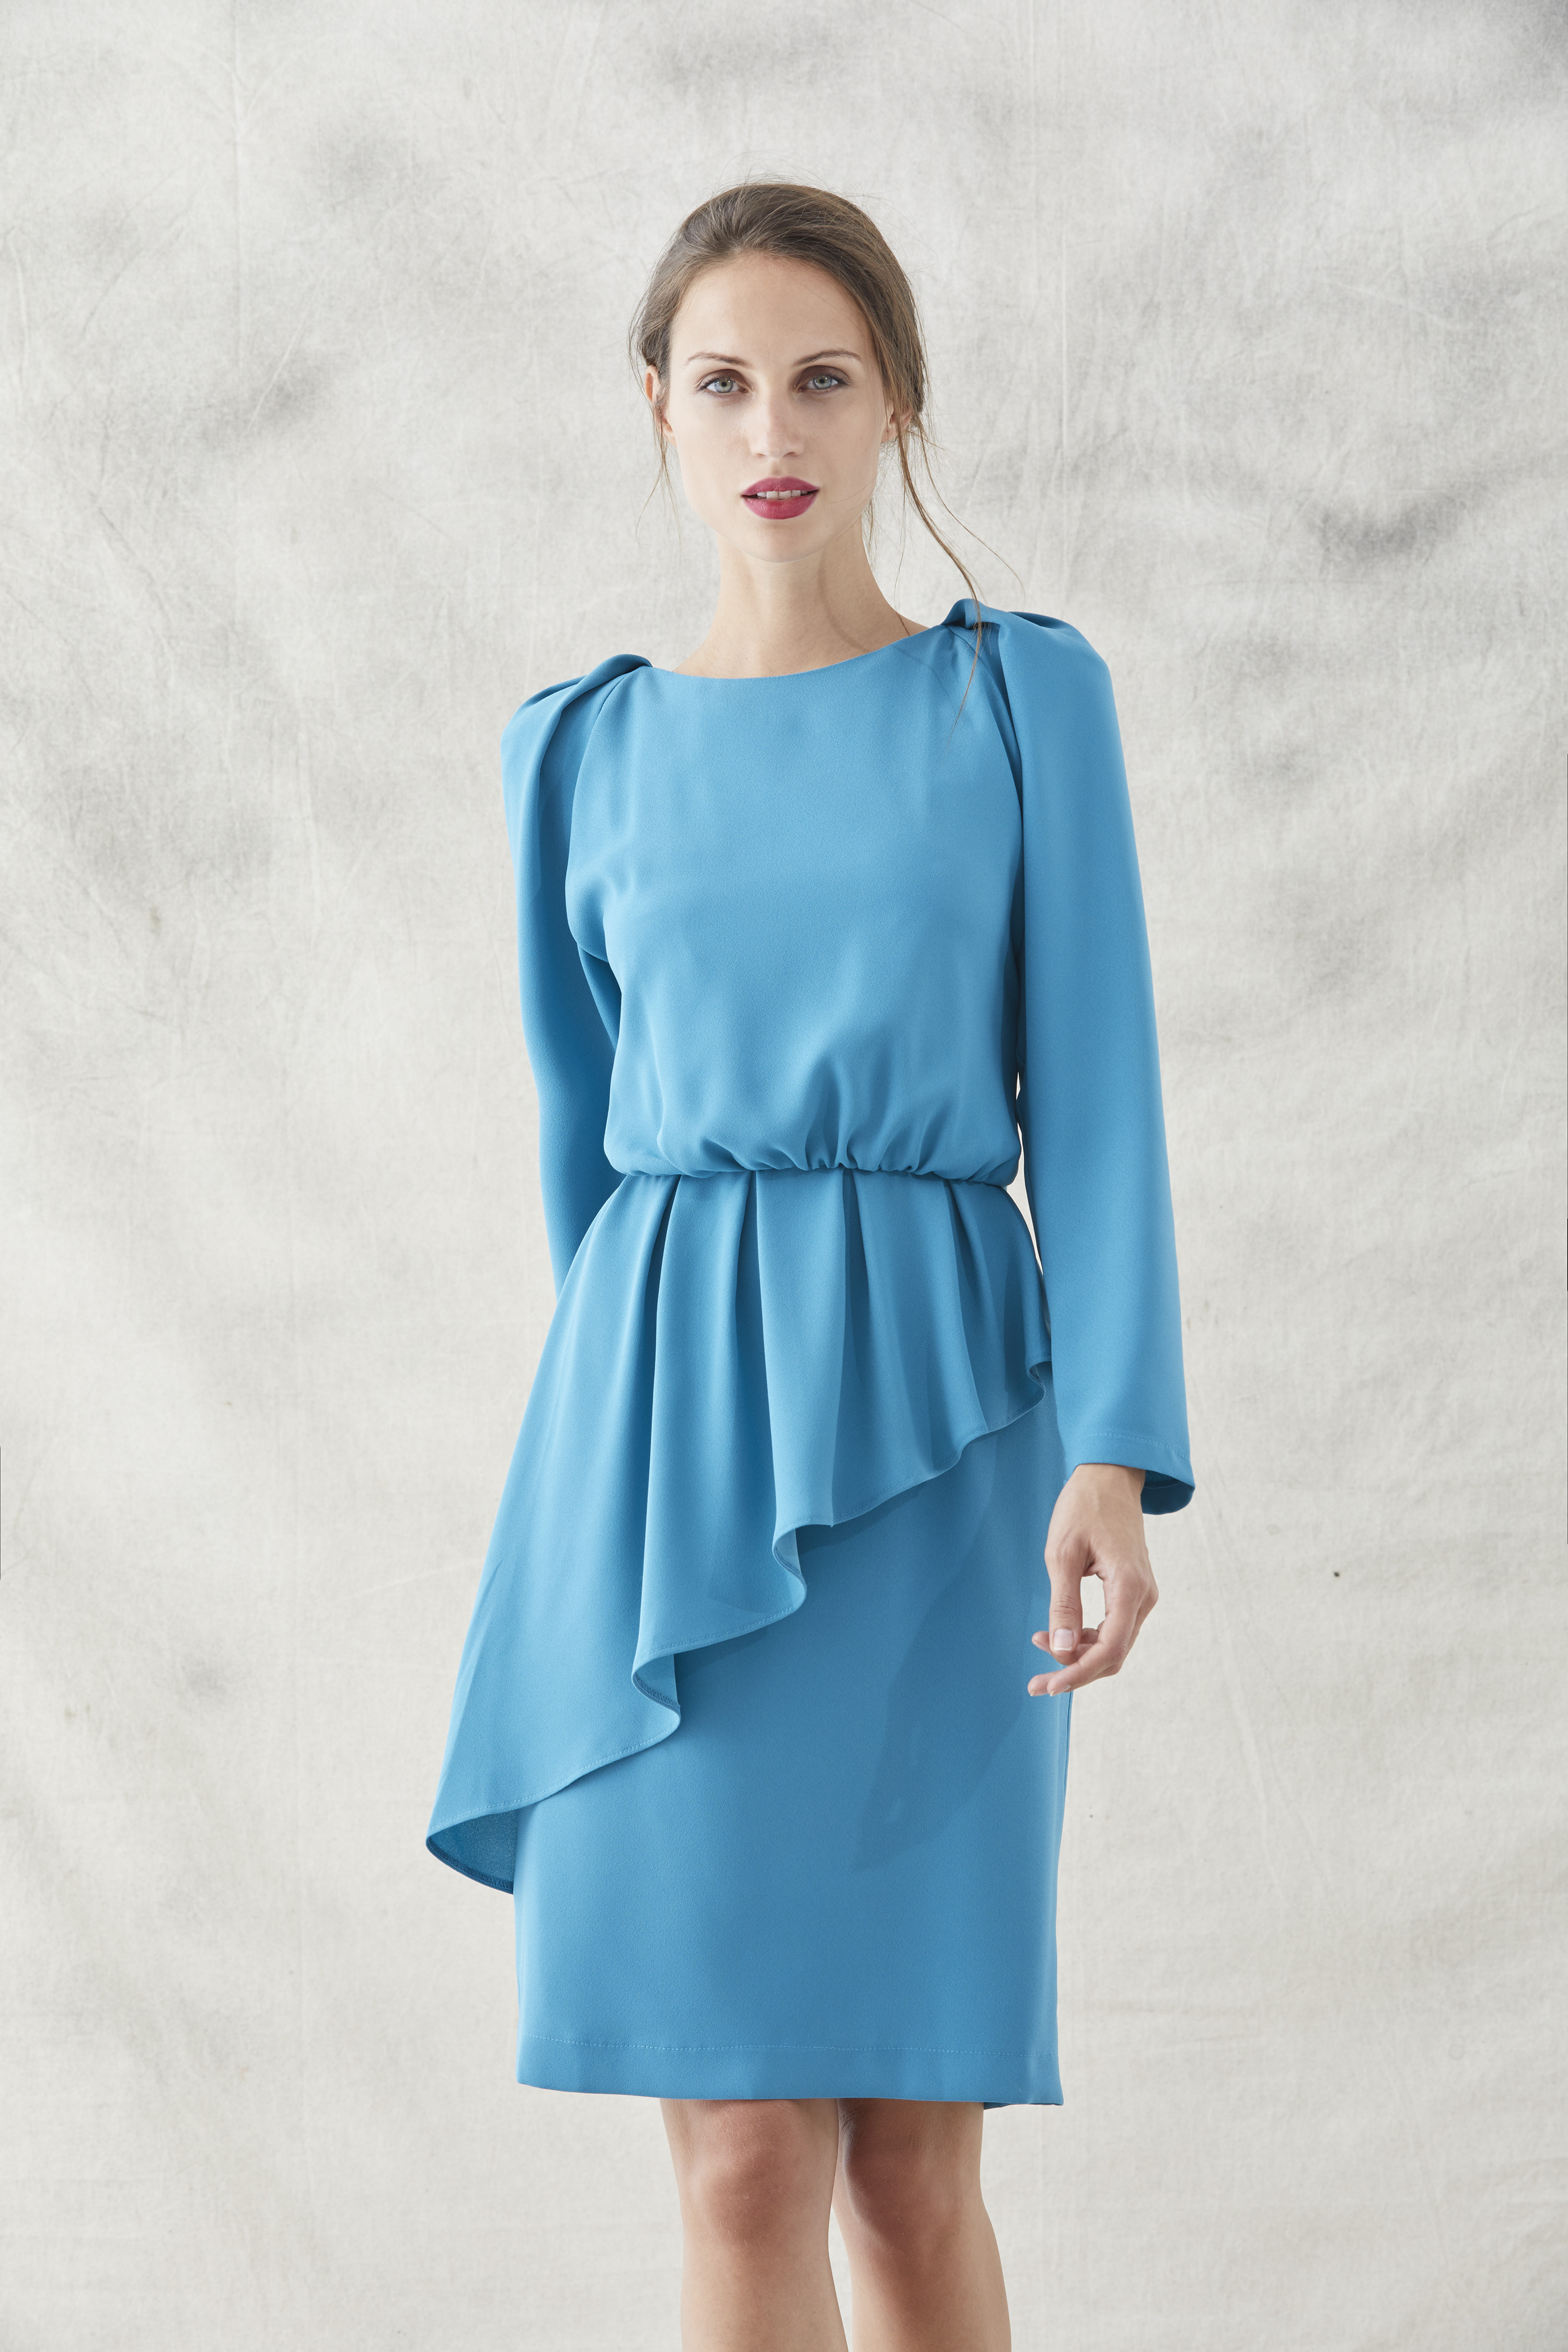 vestido azul con peplum lauren manga larga de apparentia